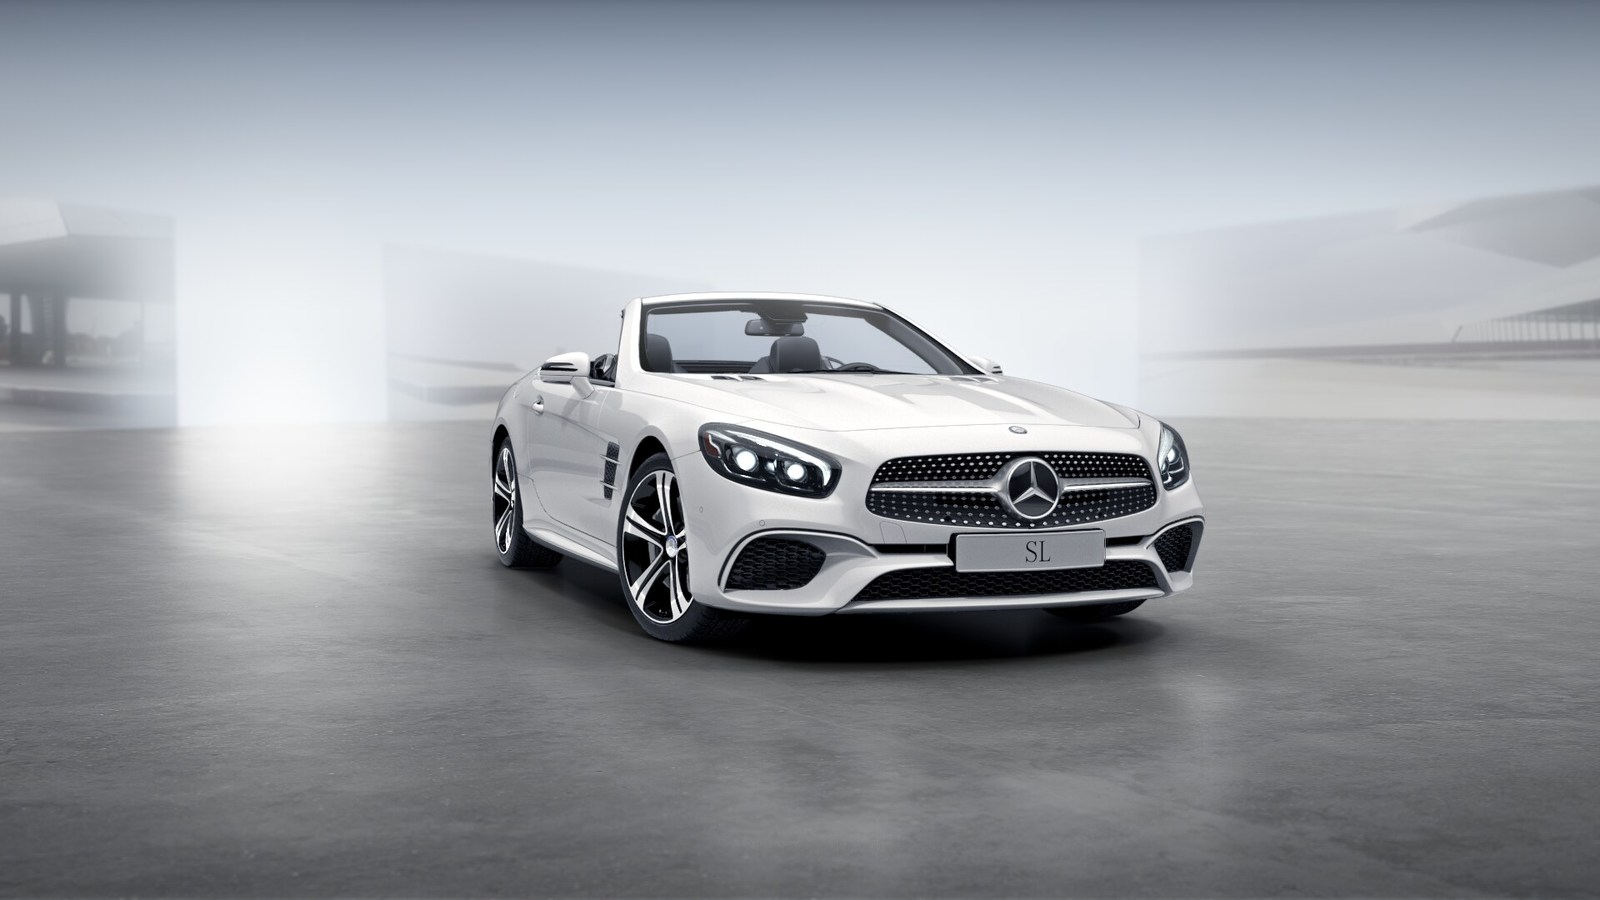 New 2017 mercedes benz sl class sl450 2 door coupe for Mercedes benz chandler inventory